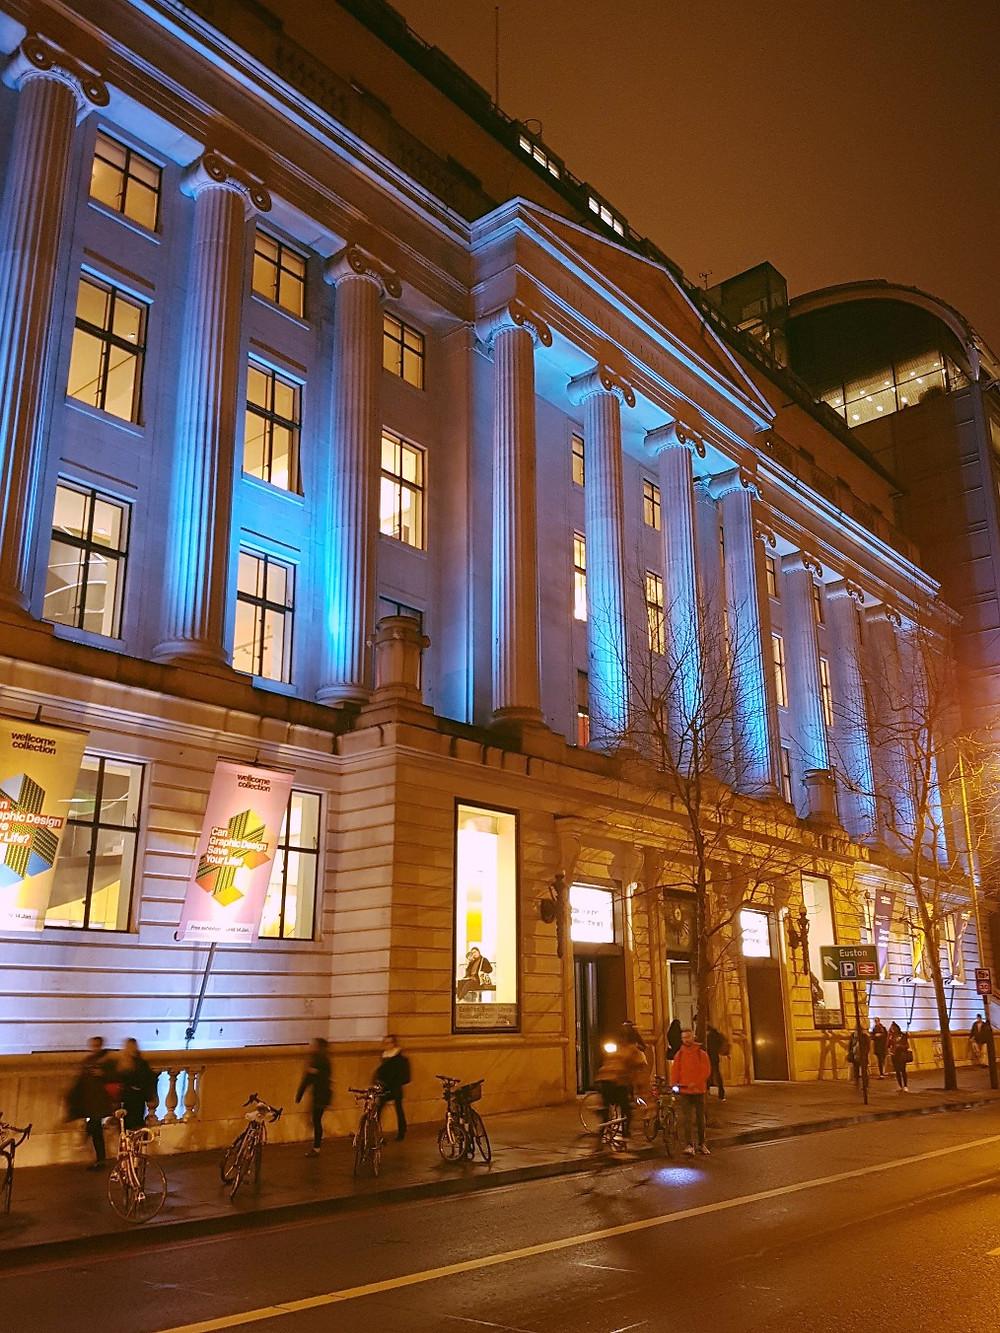 Wellcome Collection, London, England